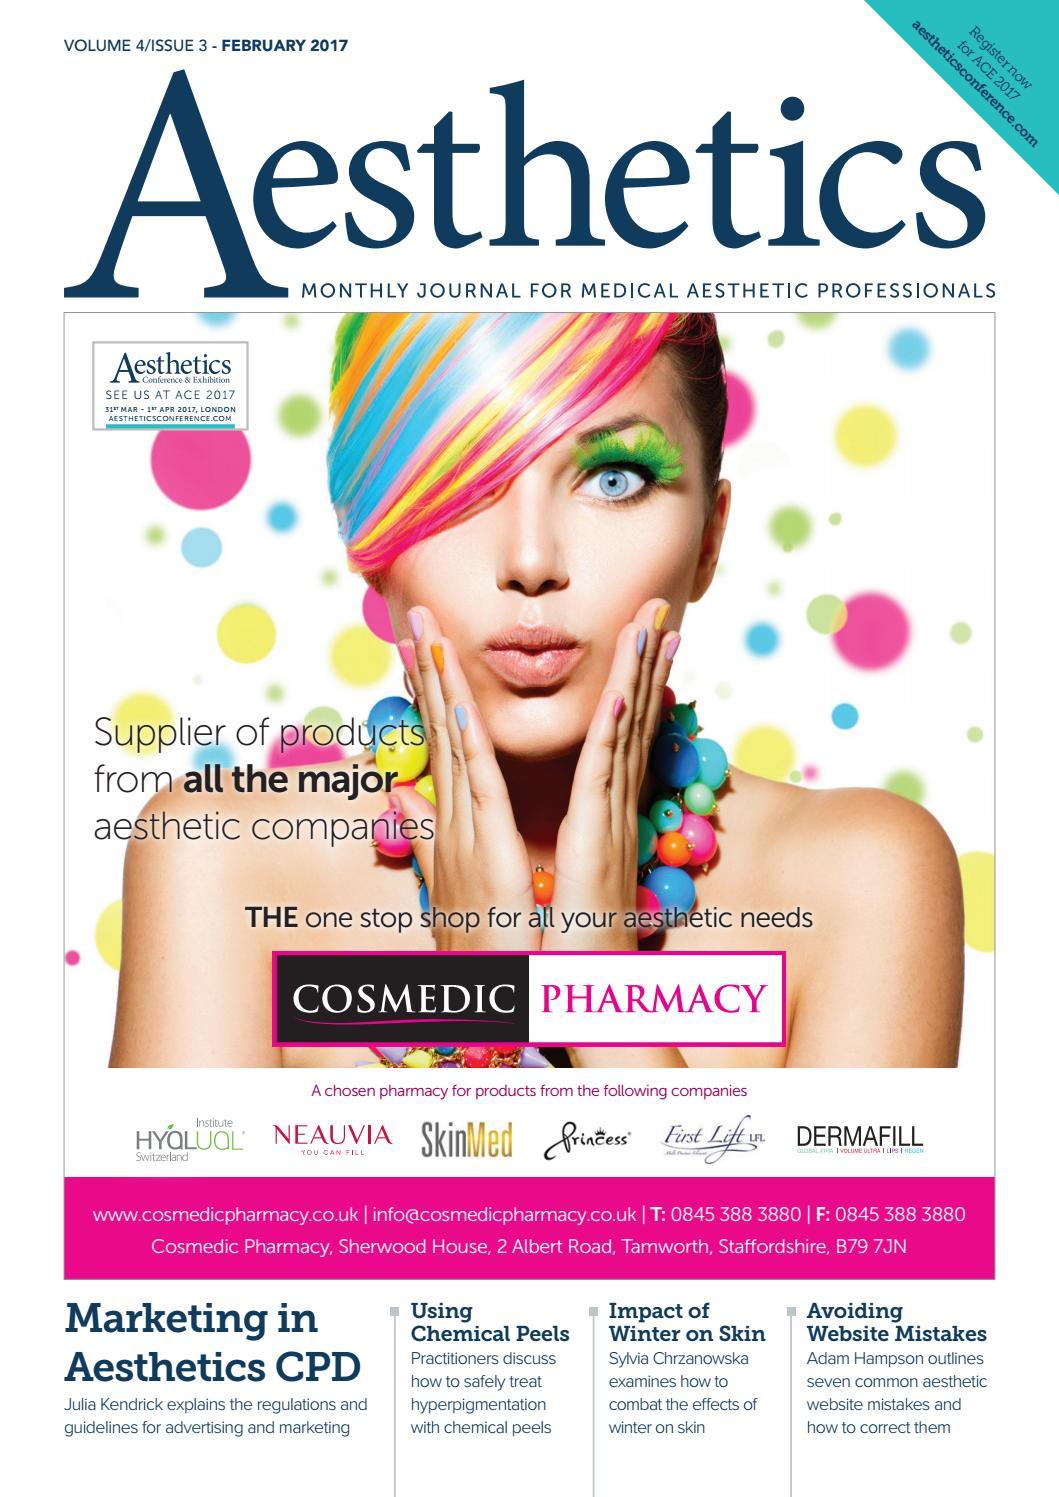 Aesthetics February 2017 by Aesthetics Journal - issuu